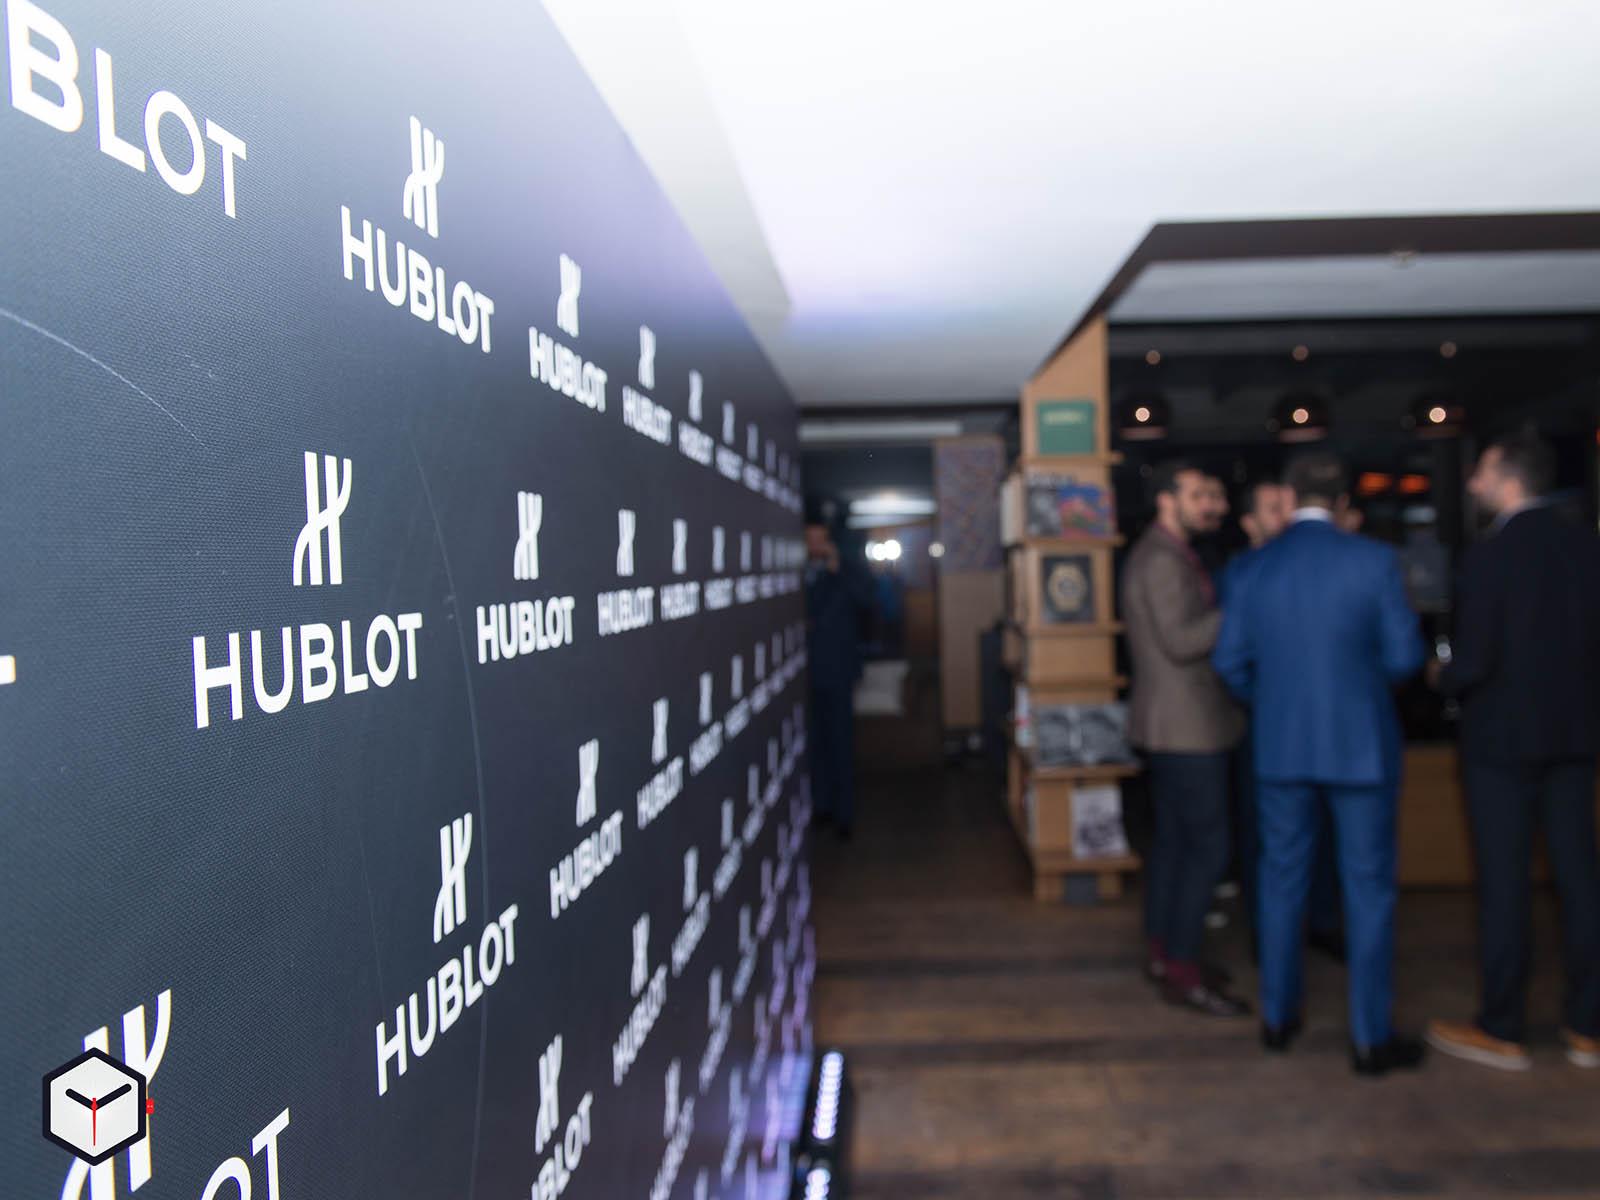 hublot-event-3.jpg